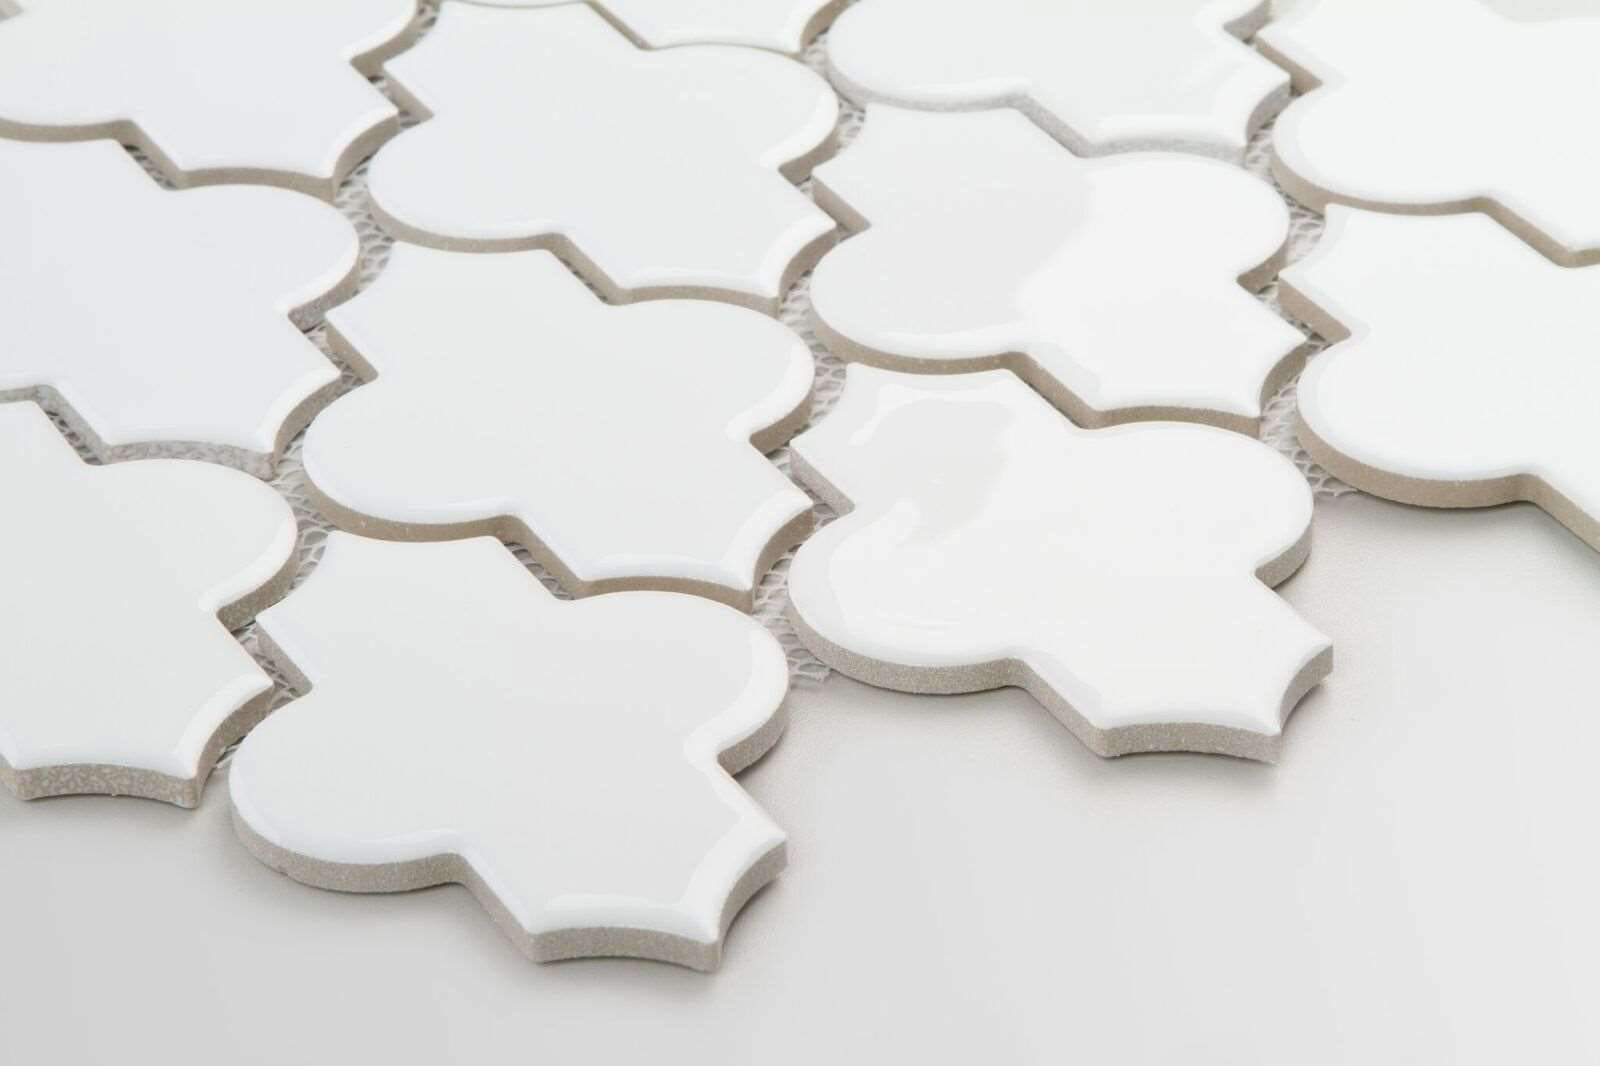 Nové mozaiky opět u nás! - Obrázok č. 3